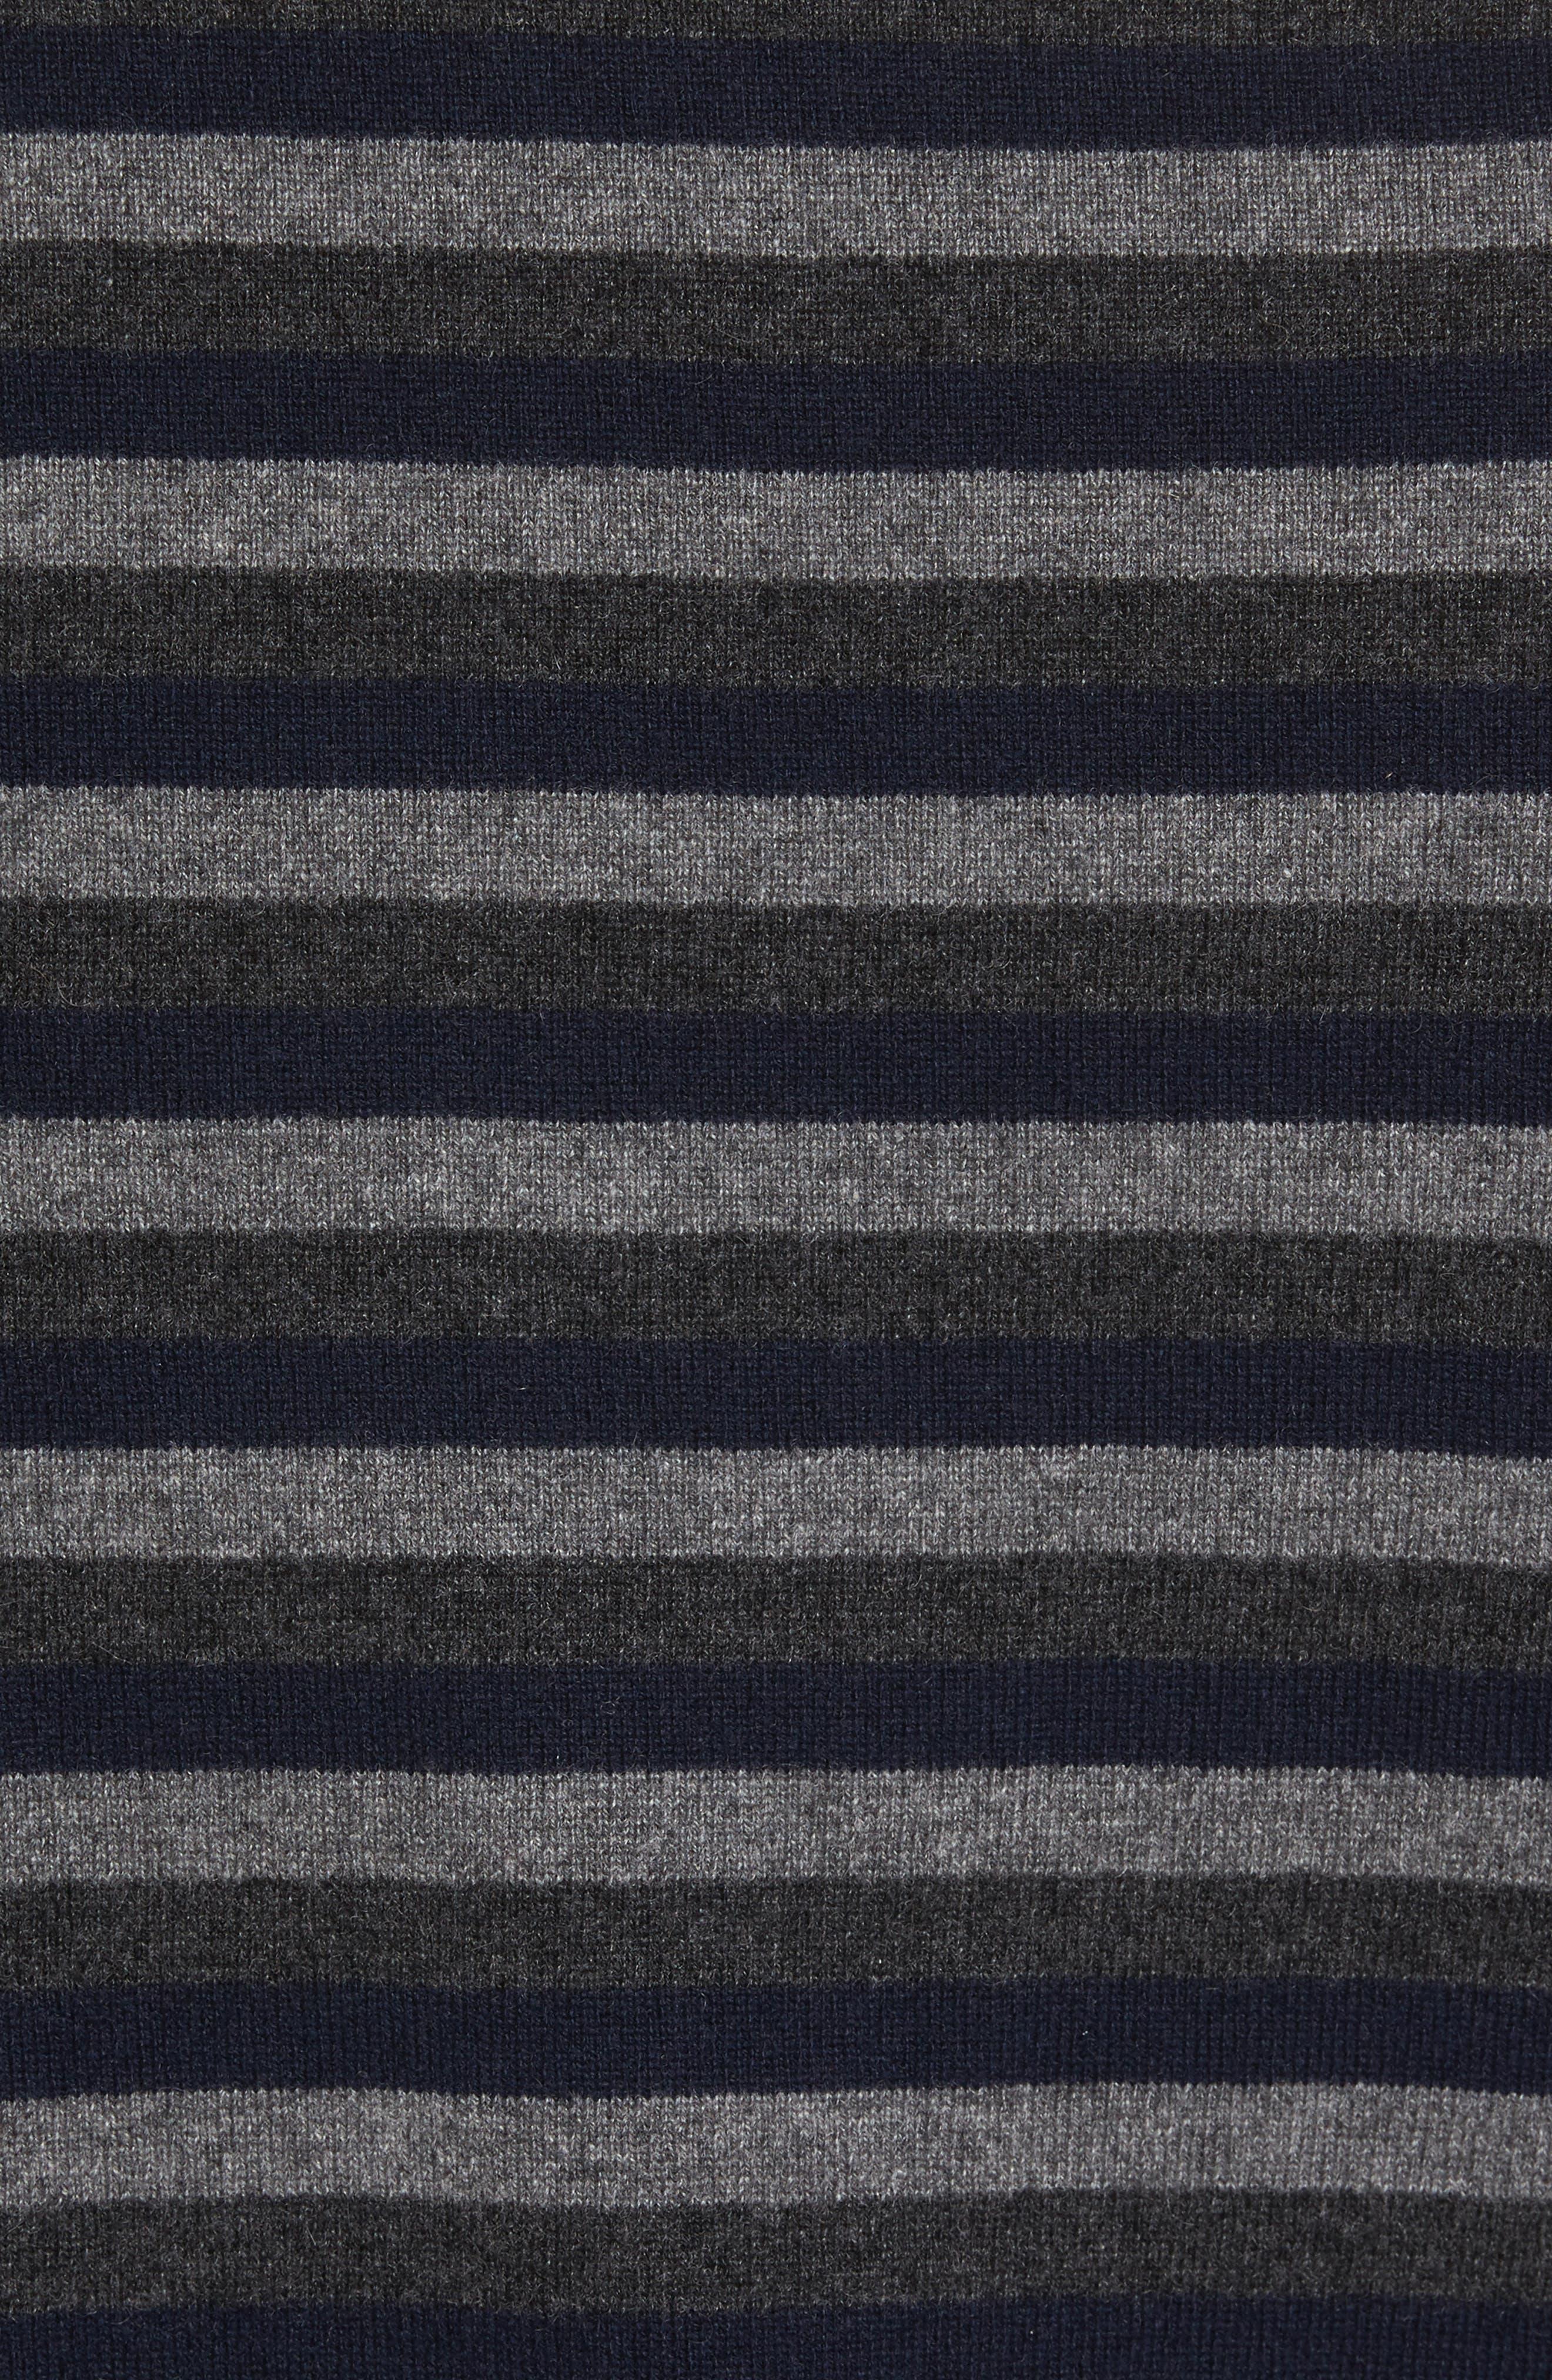 Stripe V-Neck Cashmere Sweater,                             Alternate thumbnail 5, color,                             406